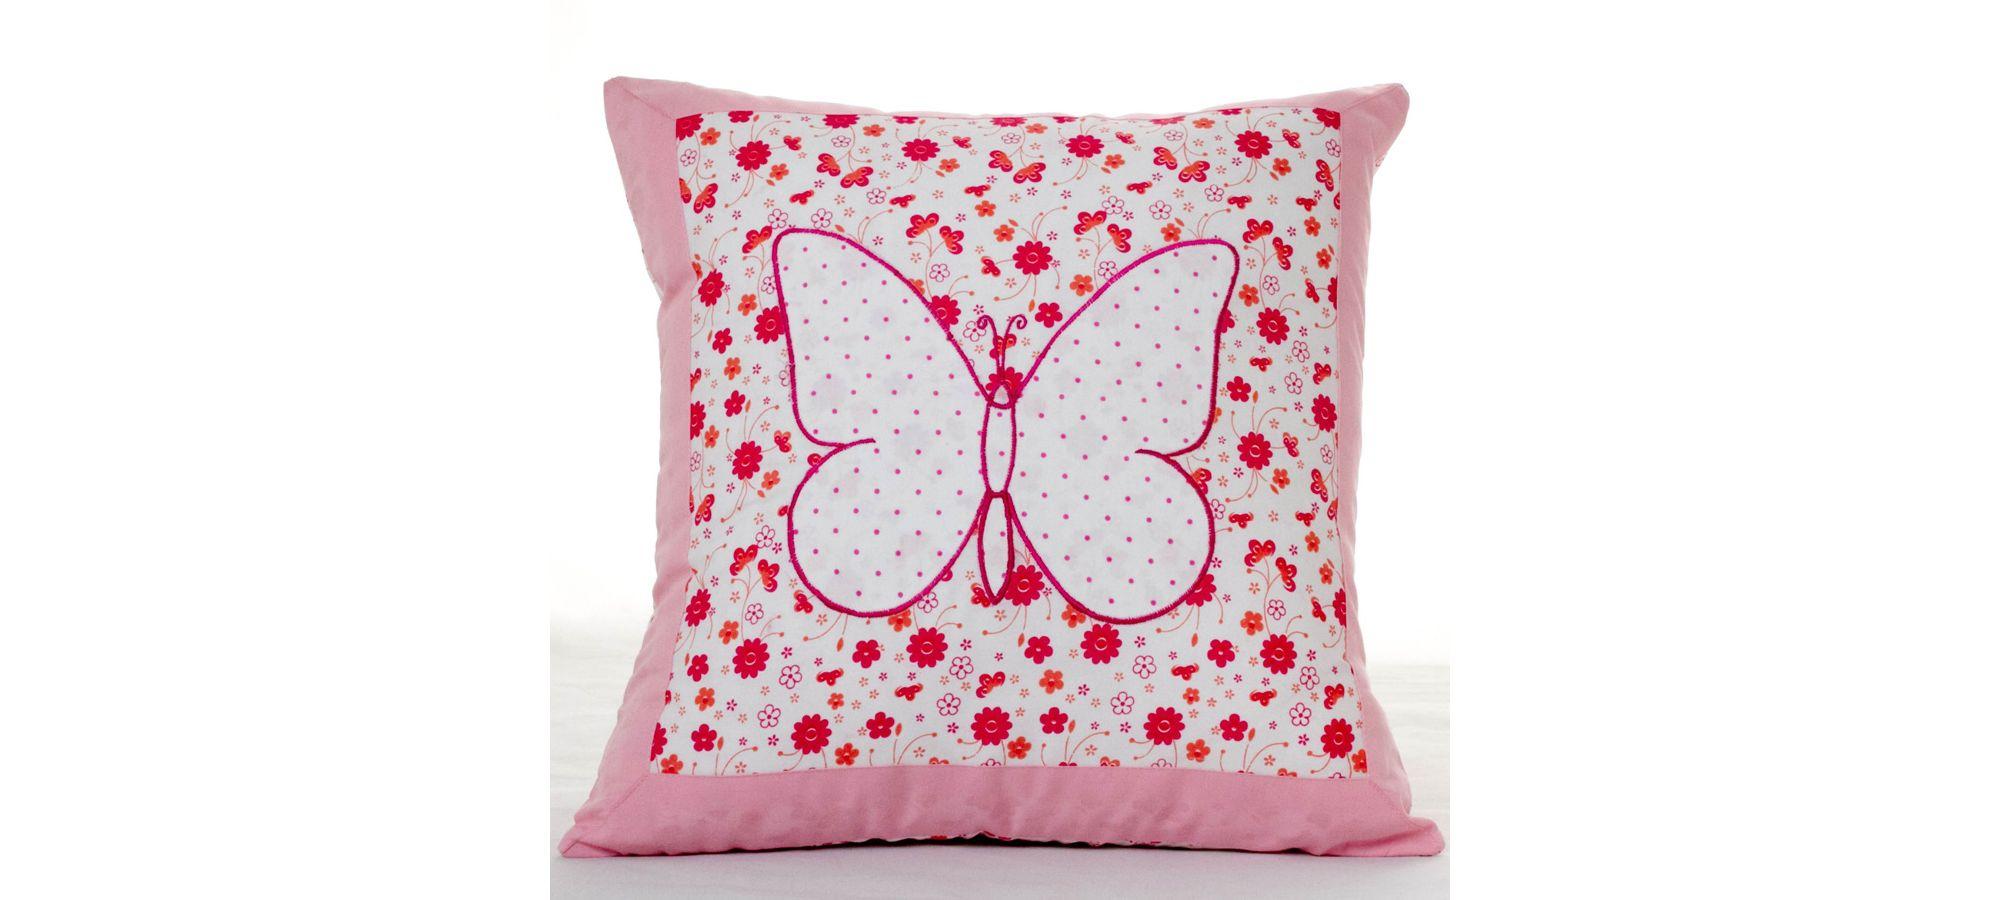 Pink Butterfly Cotton Children's Cushion